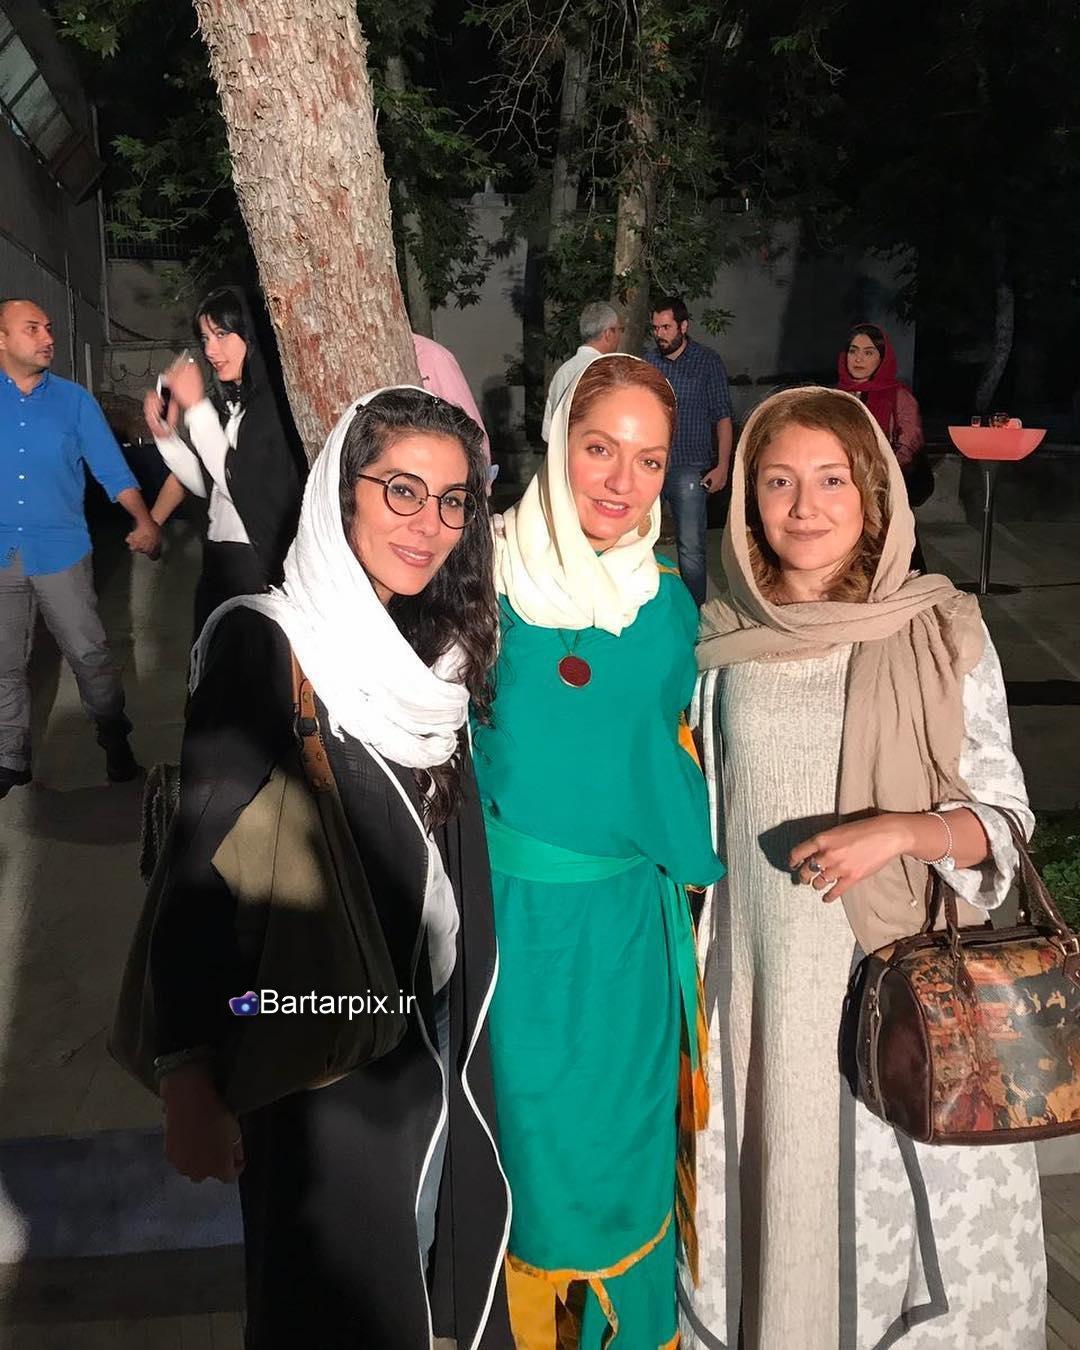 http://s9.picofile.com/file/8294700868/www_bartarpix_ir_mahnaz_afshar_sal_96_4_.jpg